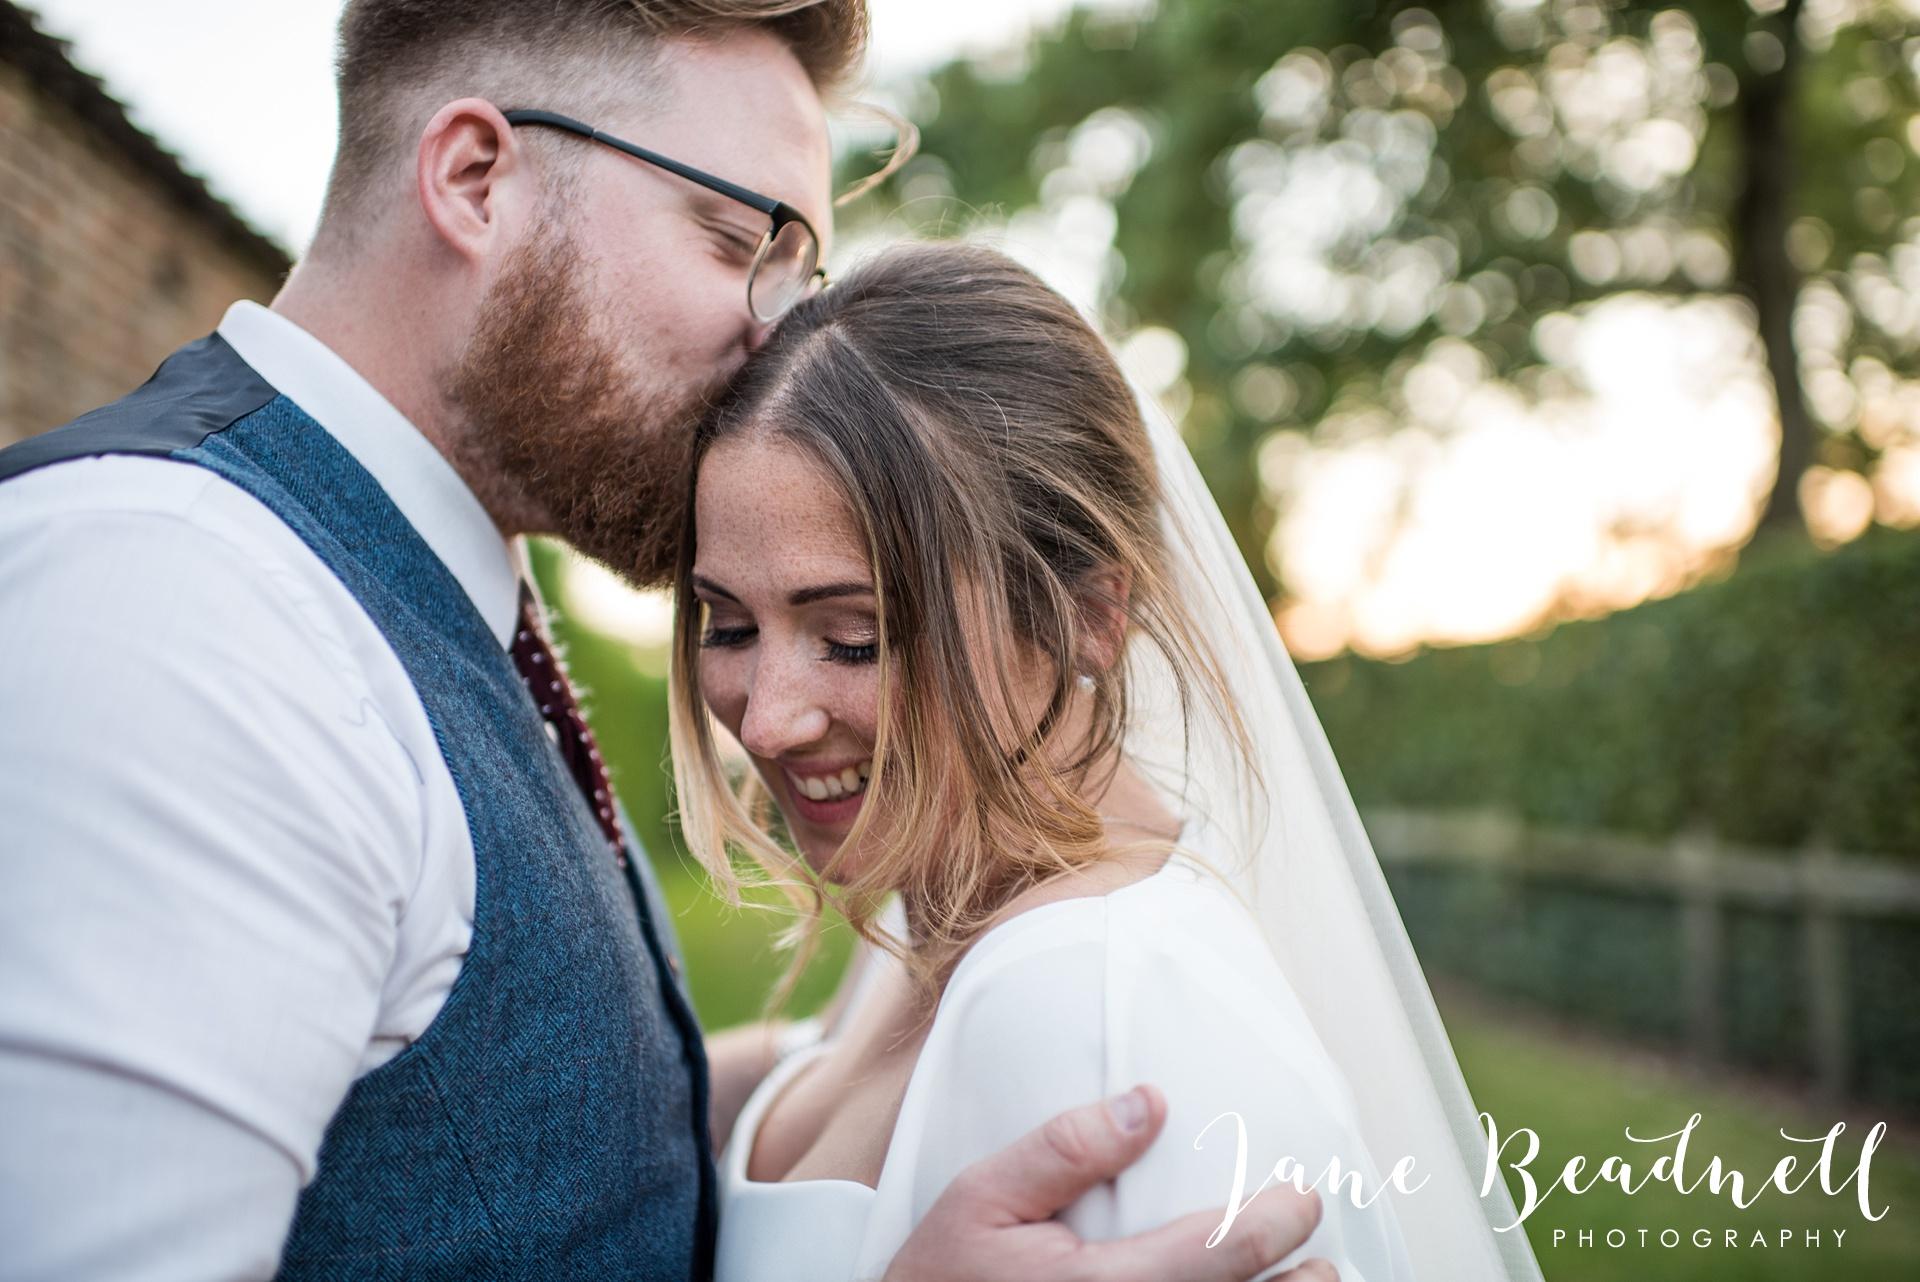 fine-art-wedding-photographer-jane-beadnell-yorkshire-wedding-photographer-garden-wedding_0152